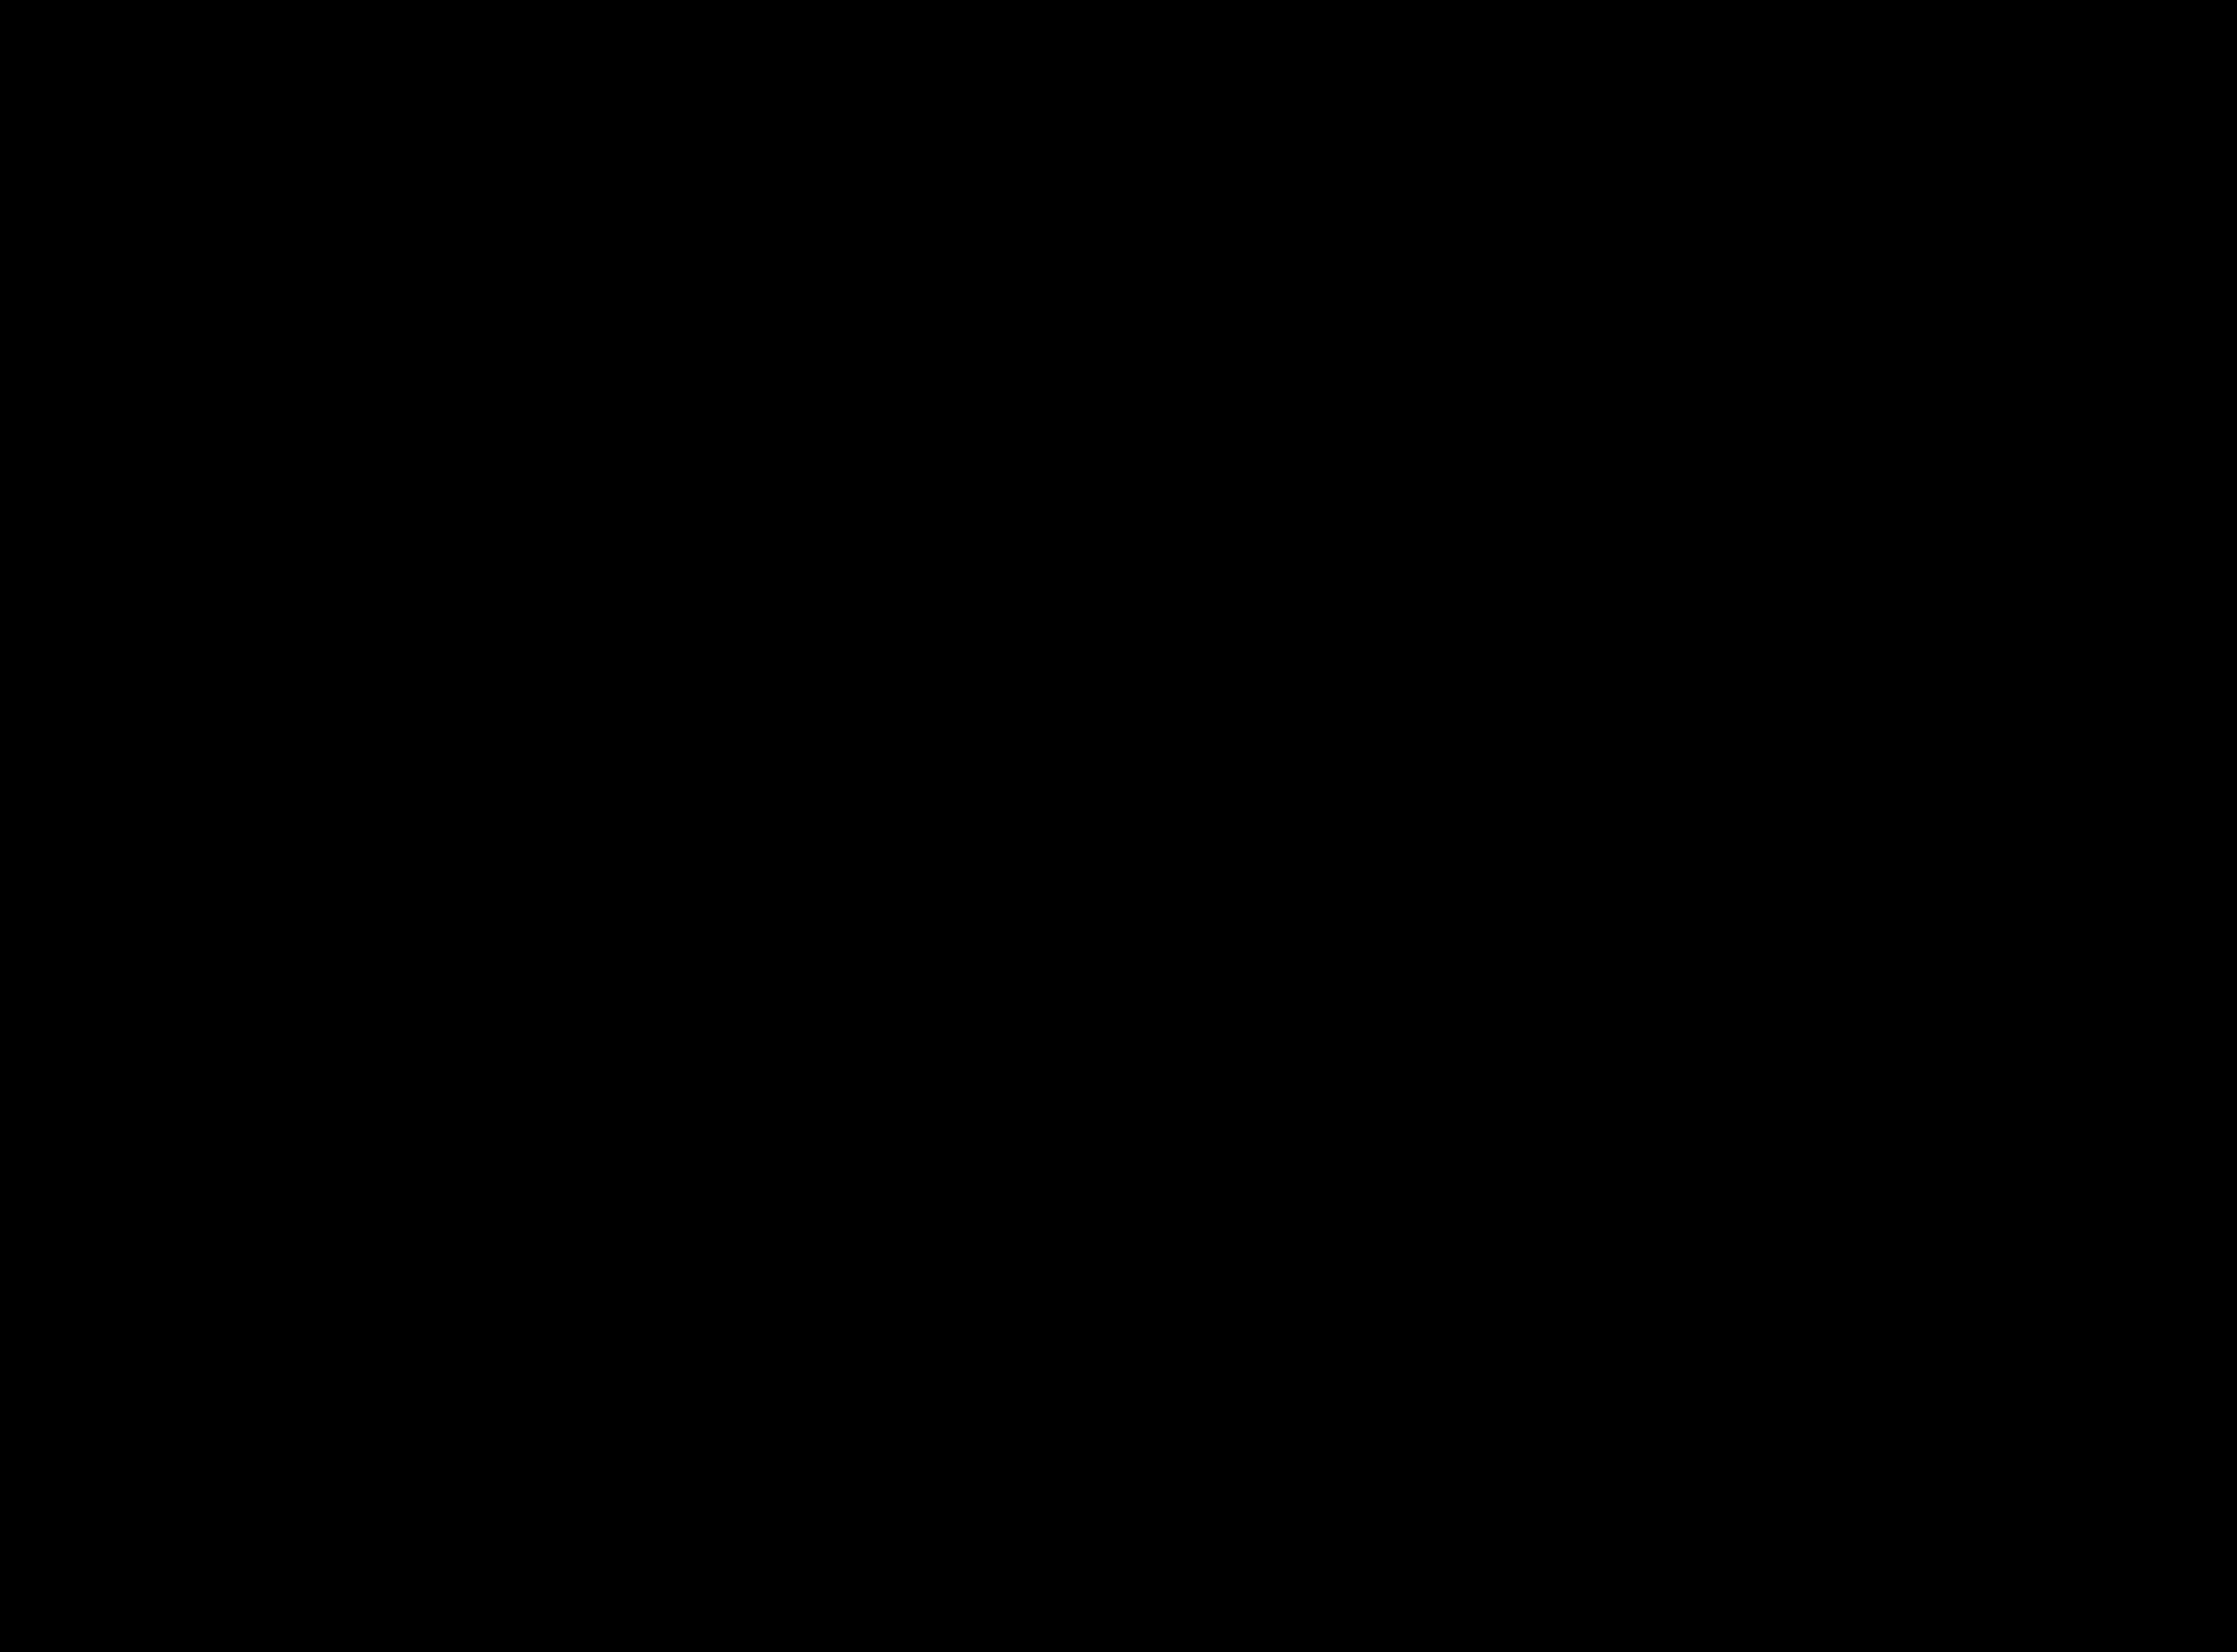 4183x3090 Black Airplane Silhouette